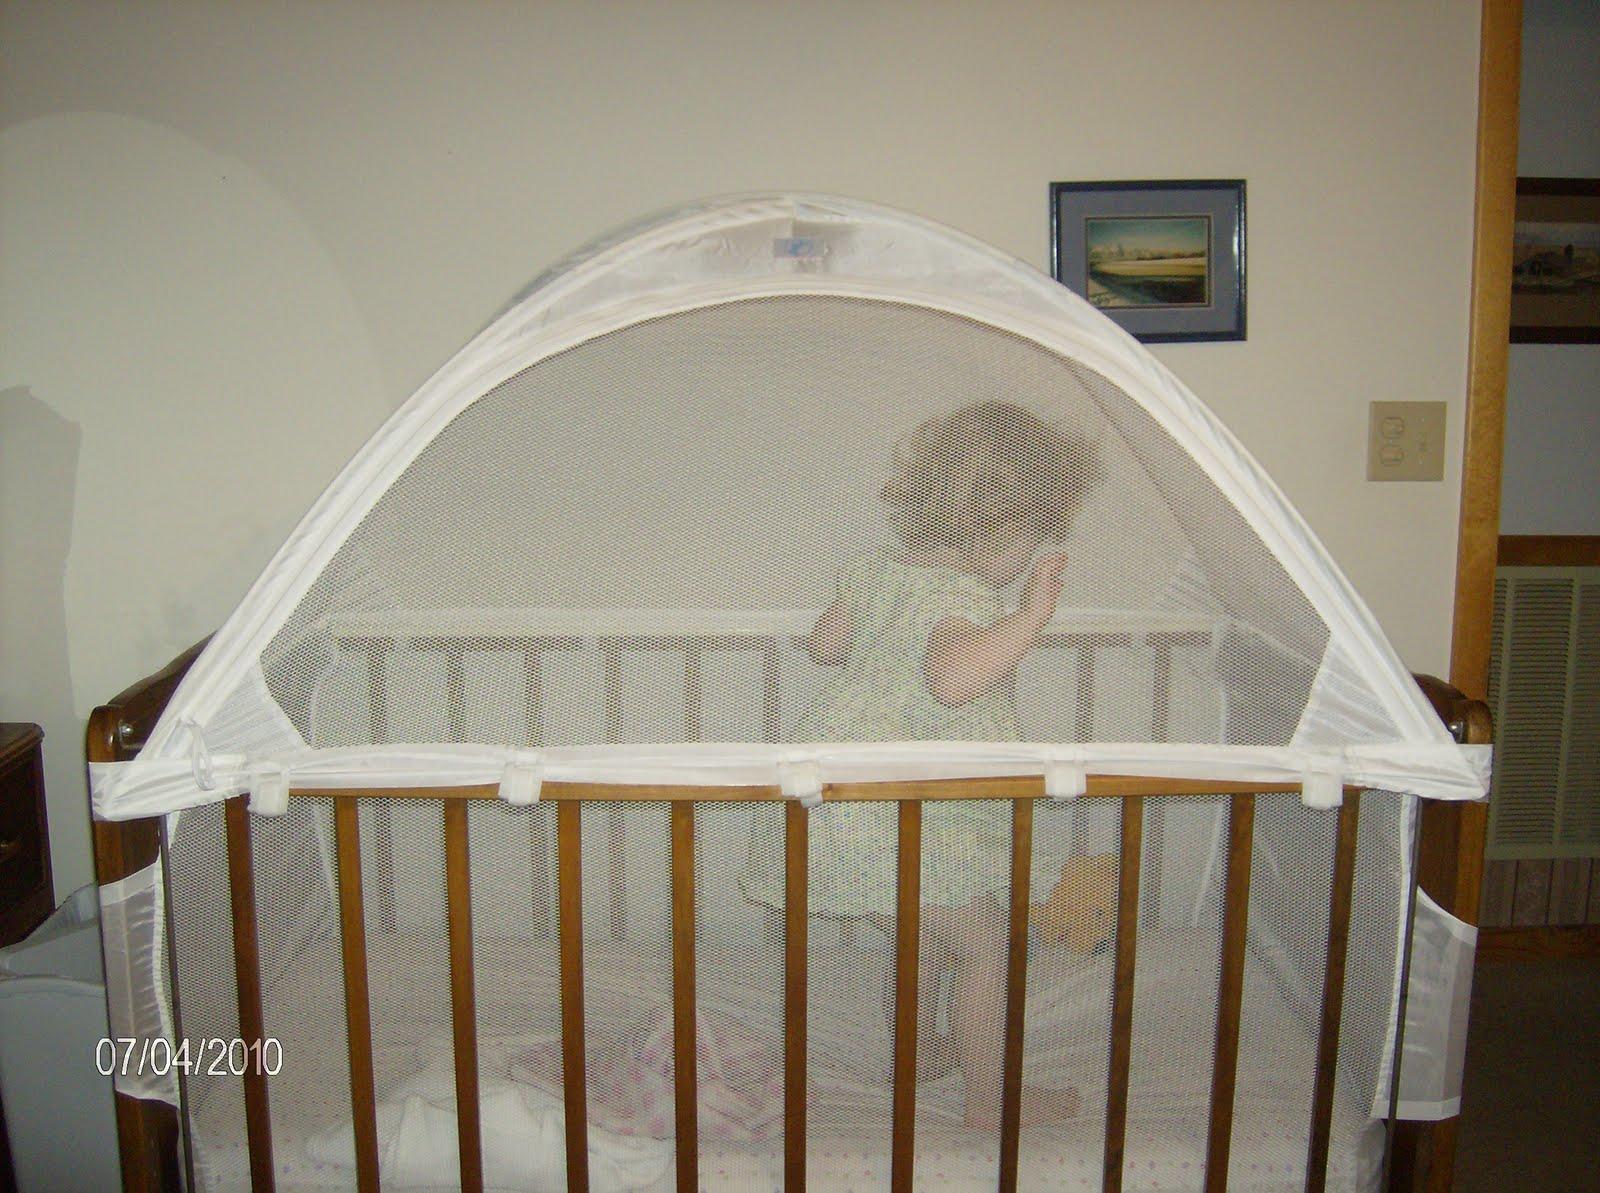 80 Crib Tent Ii Cozy Crib Tent Ii Walmart The Superior Baby Walmart 5 With Design